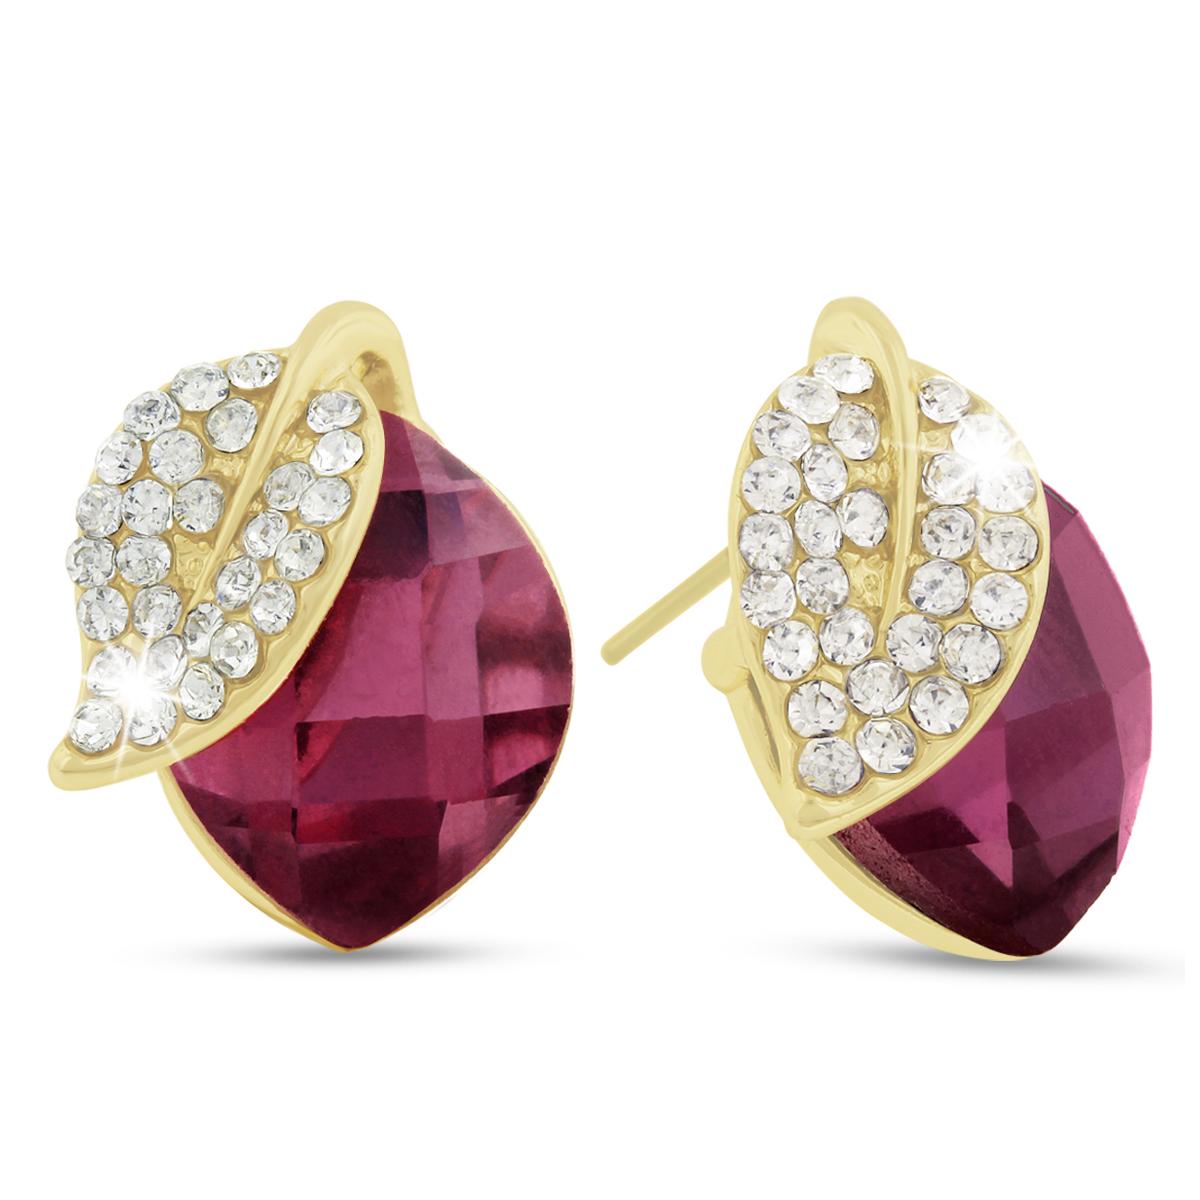 Pink Cherry Swarovski Elements Stud Earrings, Pushbacks by SuperJeweler